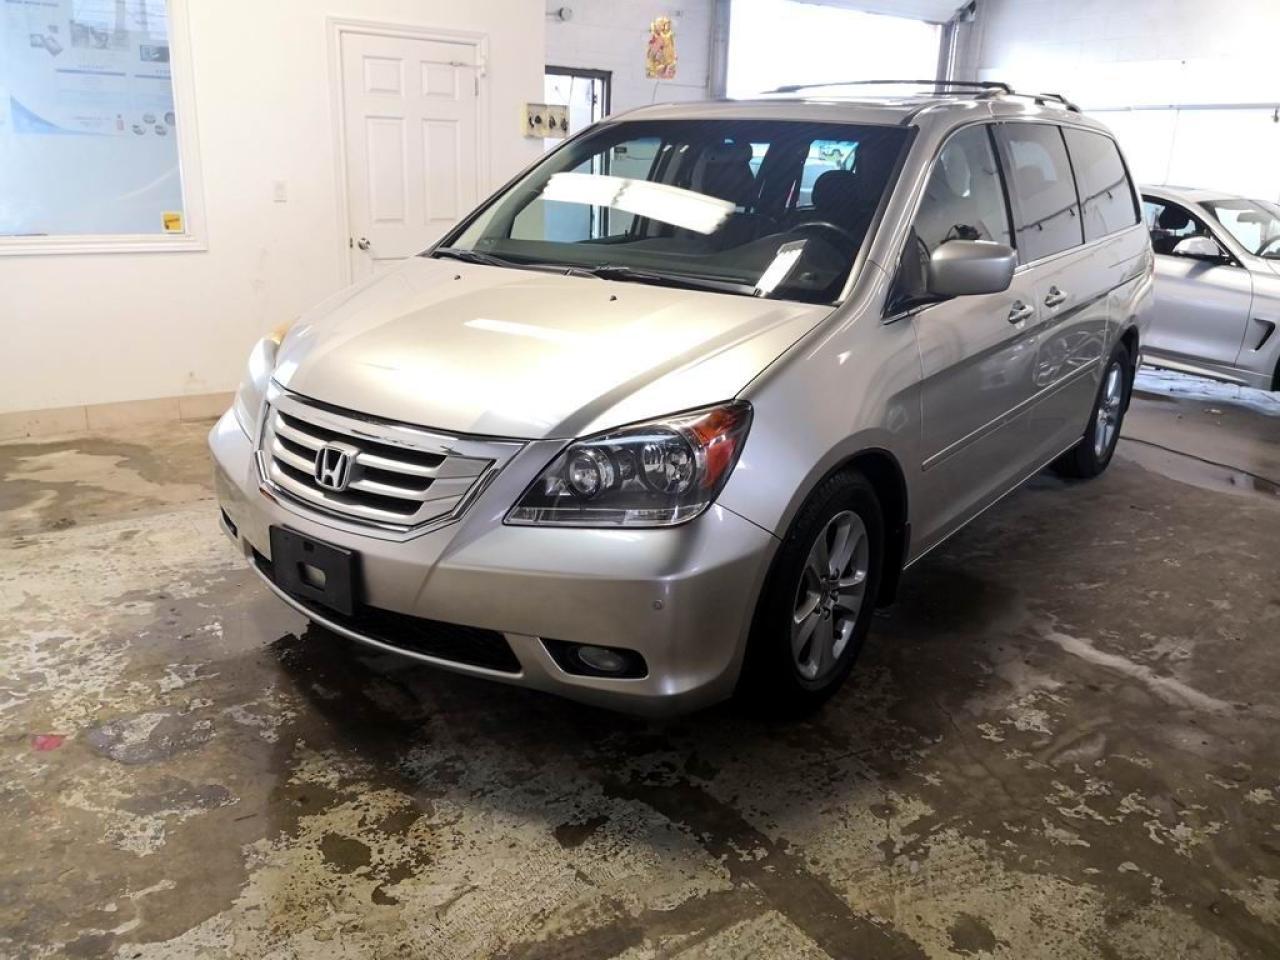 Photo of Silver 2009 Honda Odyssey